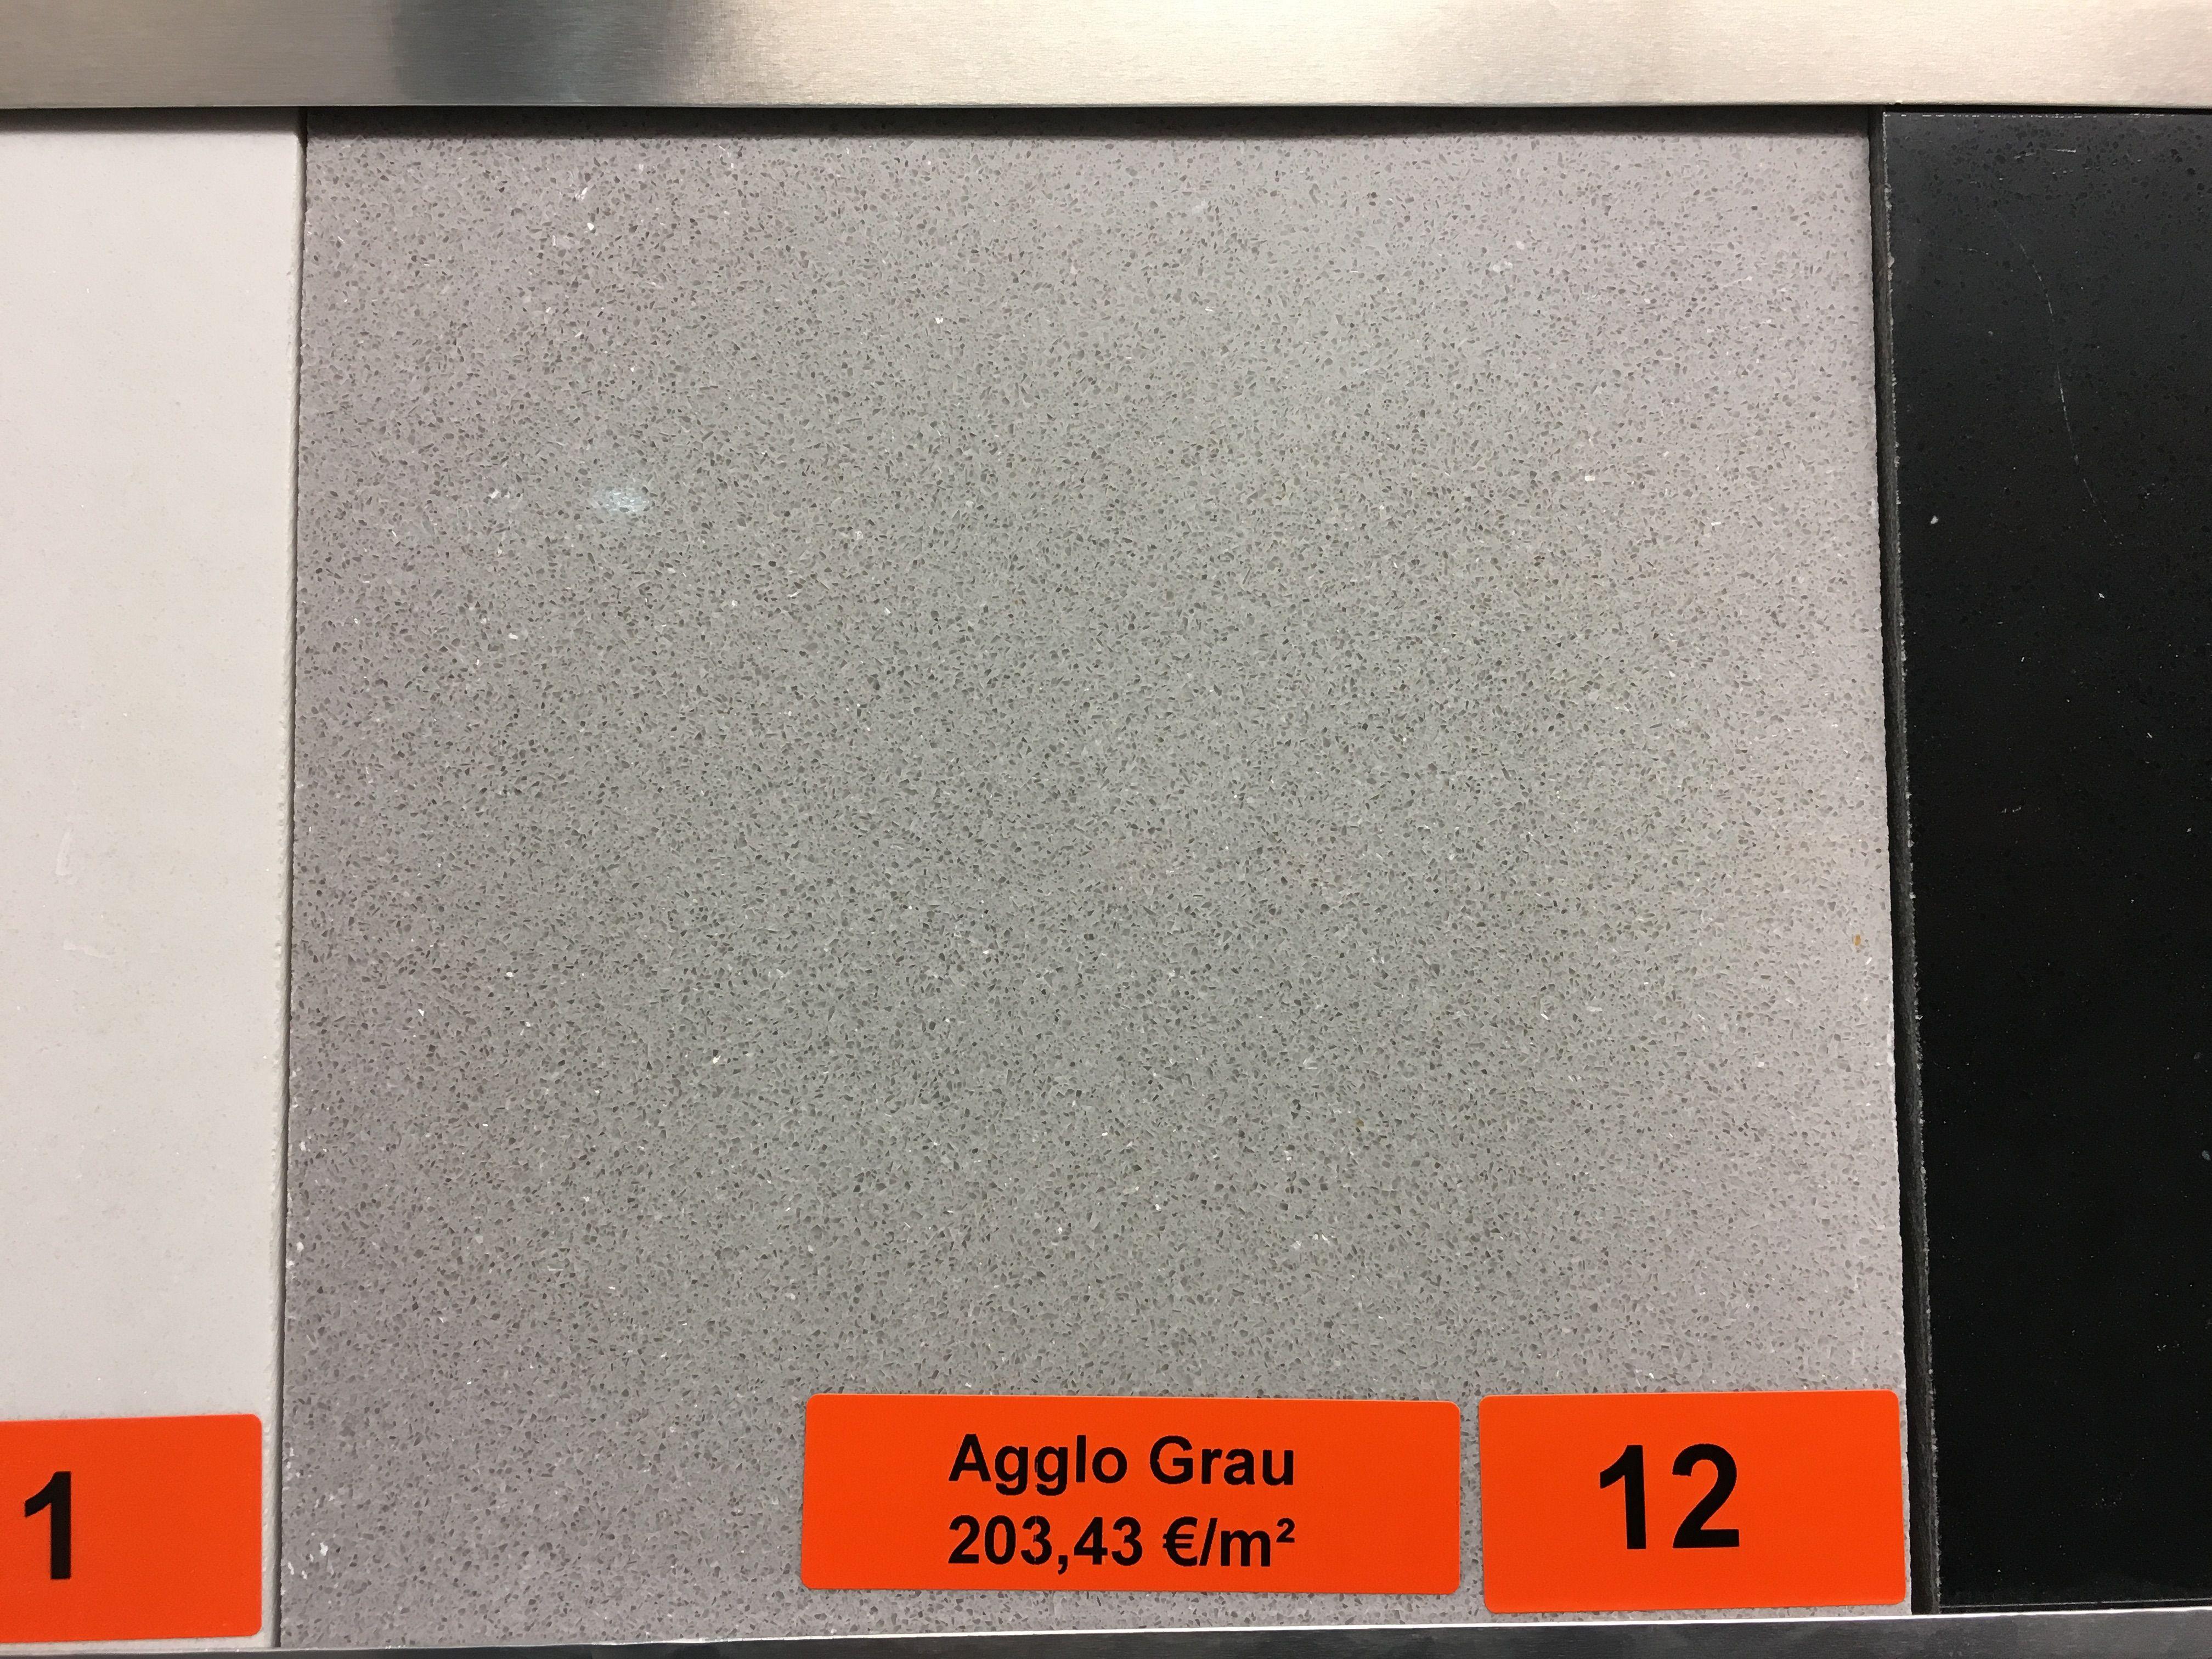 Agglo Grau Fensterbank   Windows   Pinterest